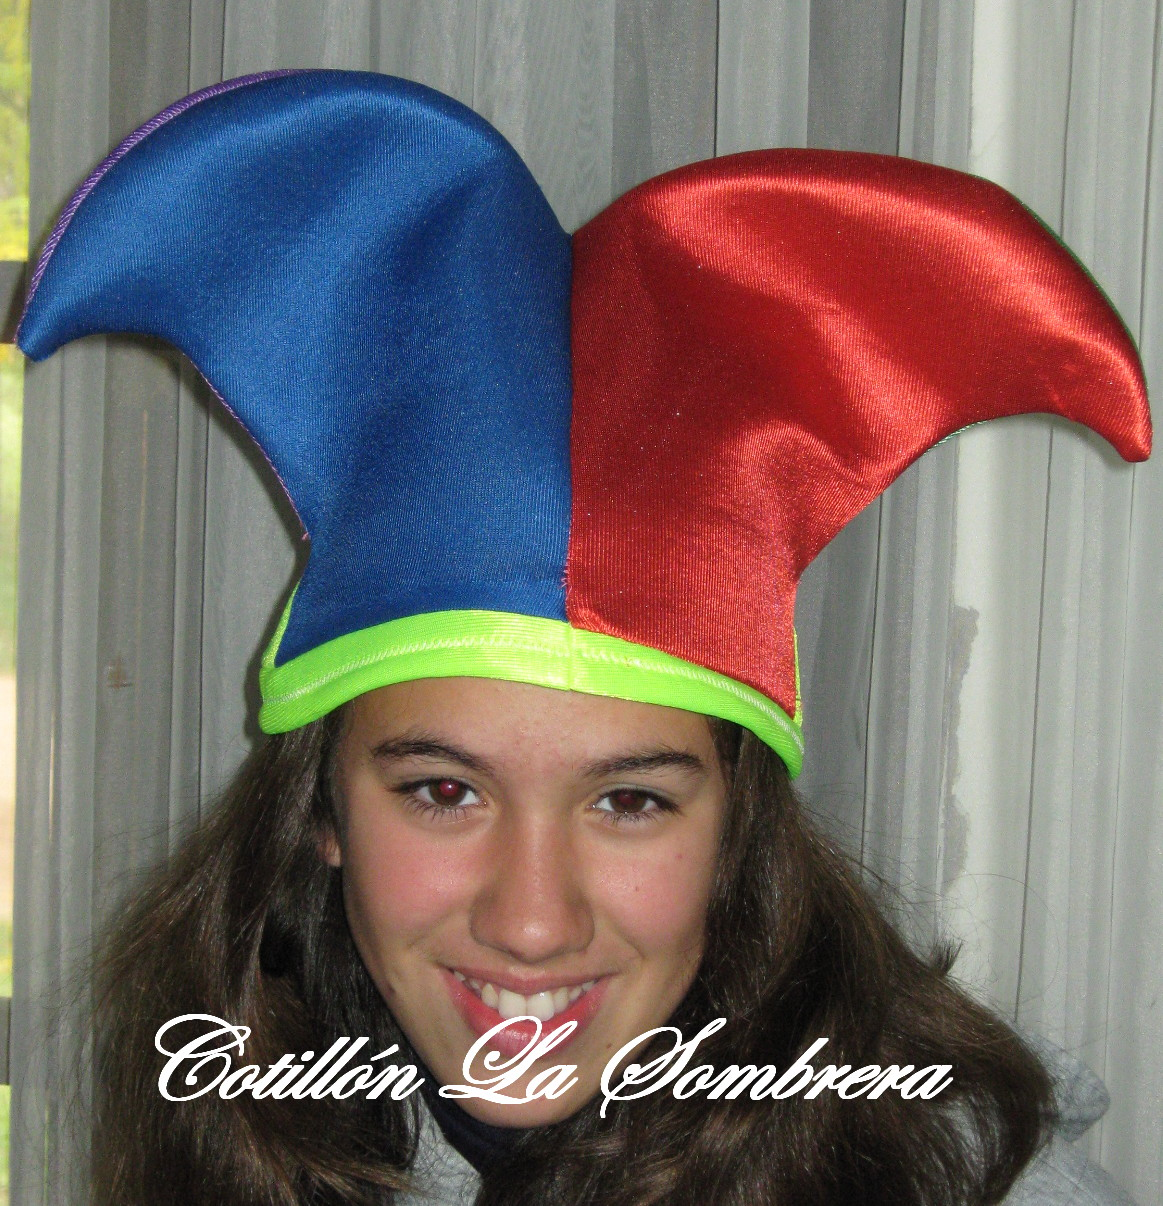 La Sombrera  Nuestro primer Arlequín 82870f208a8e